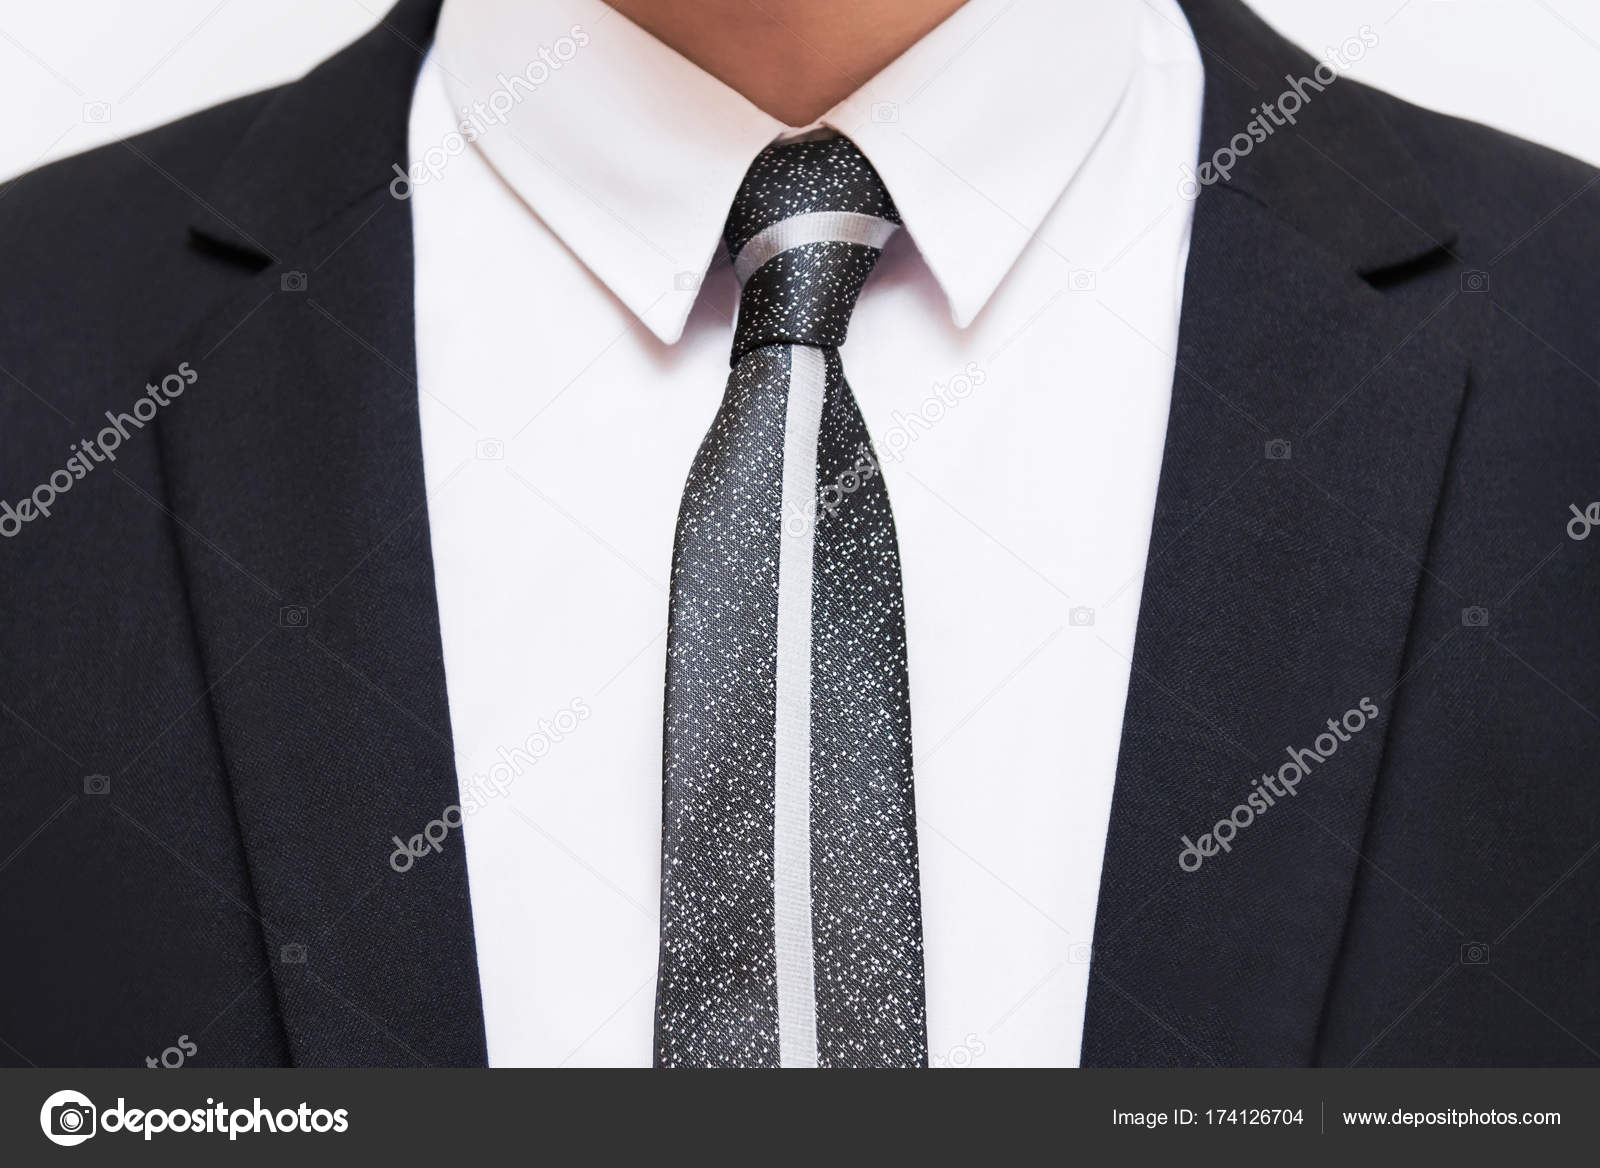 Overhemd Voor Pak.Zwarte Pak Met Wit Overhemd En Stropdas Stockfoto C Ilariya 95